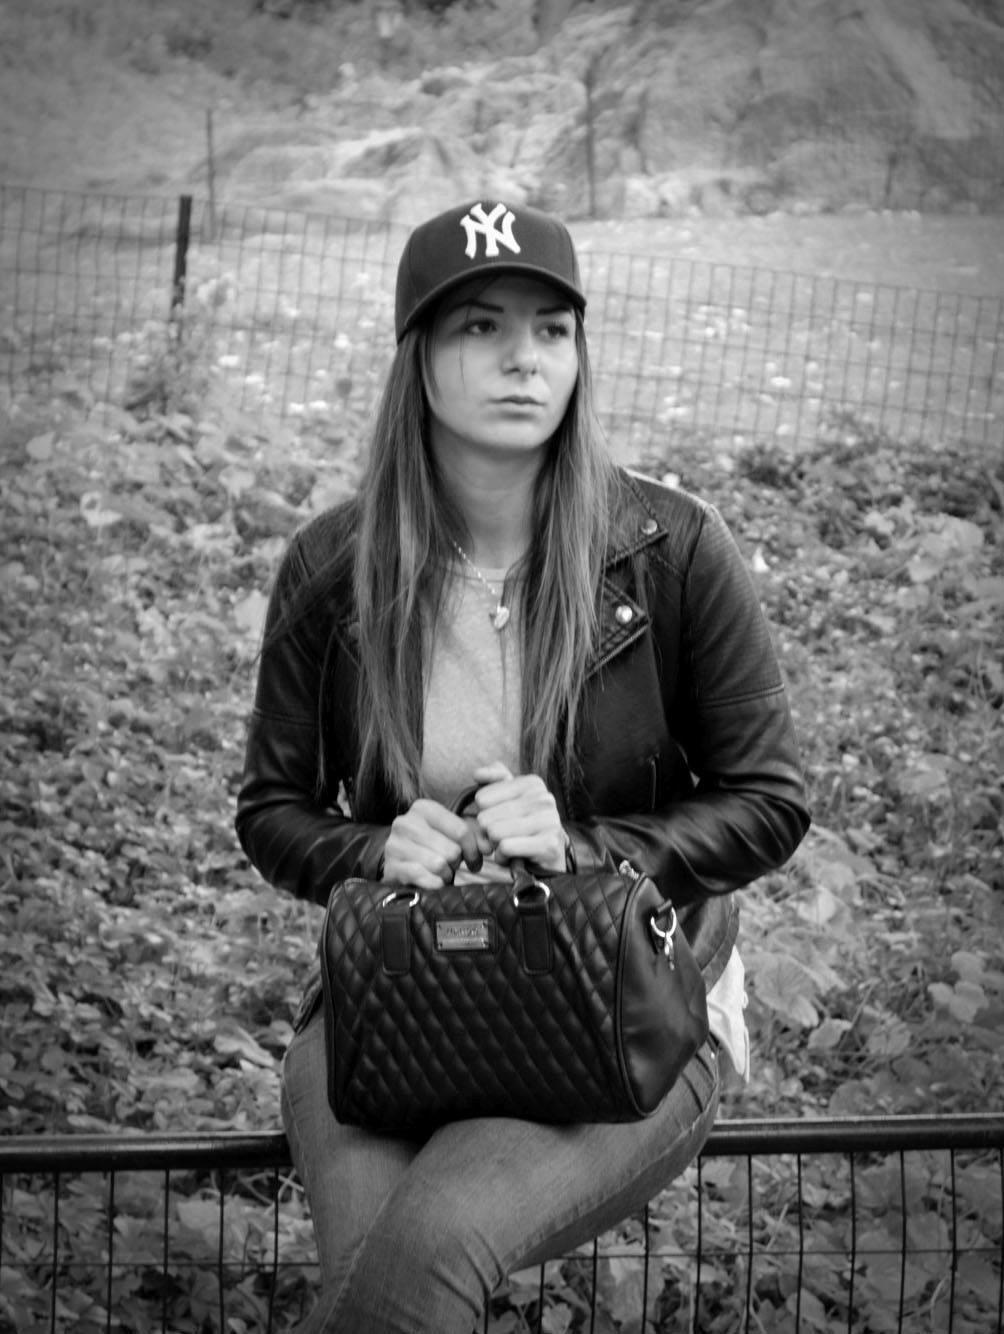 Lonely girl in the park by janaivanova88